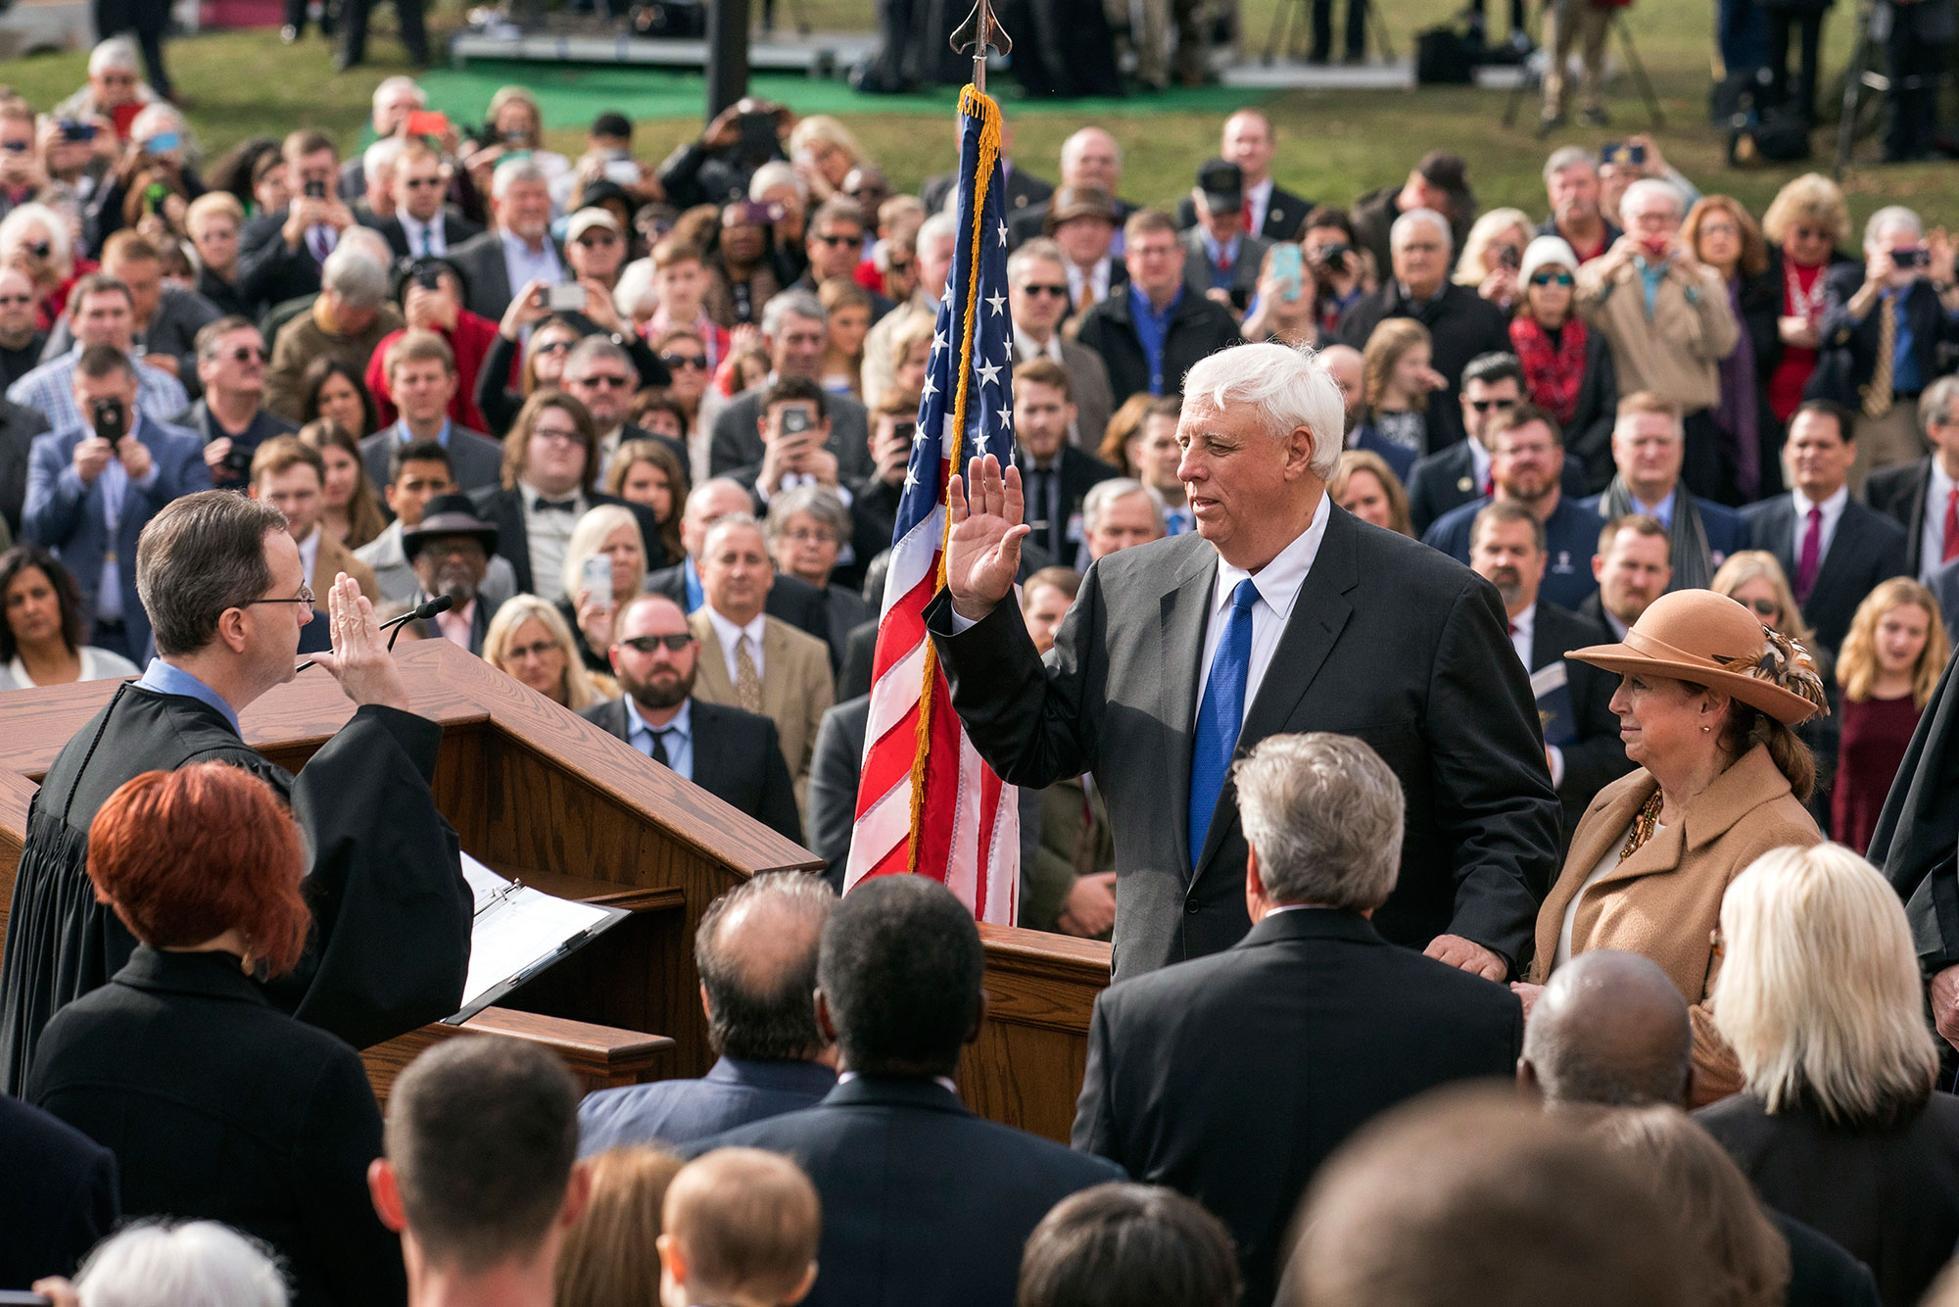 Jim Justice getting sworn in